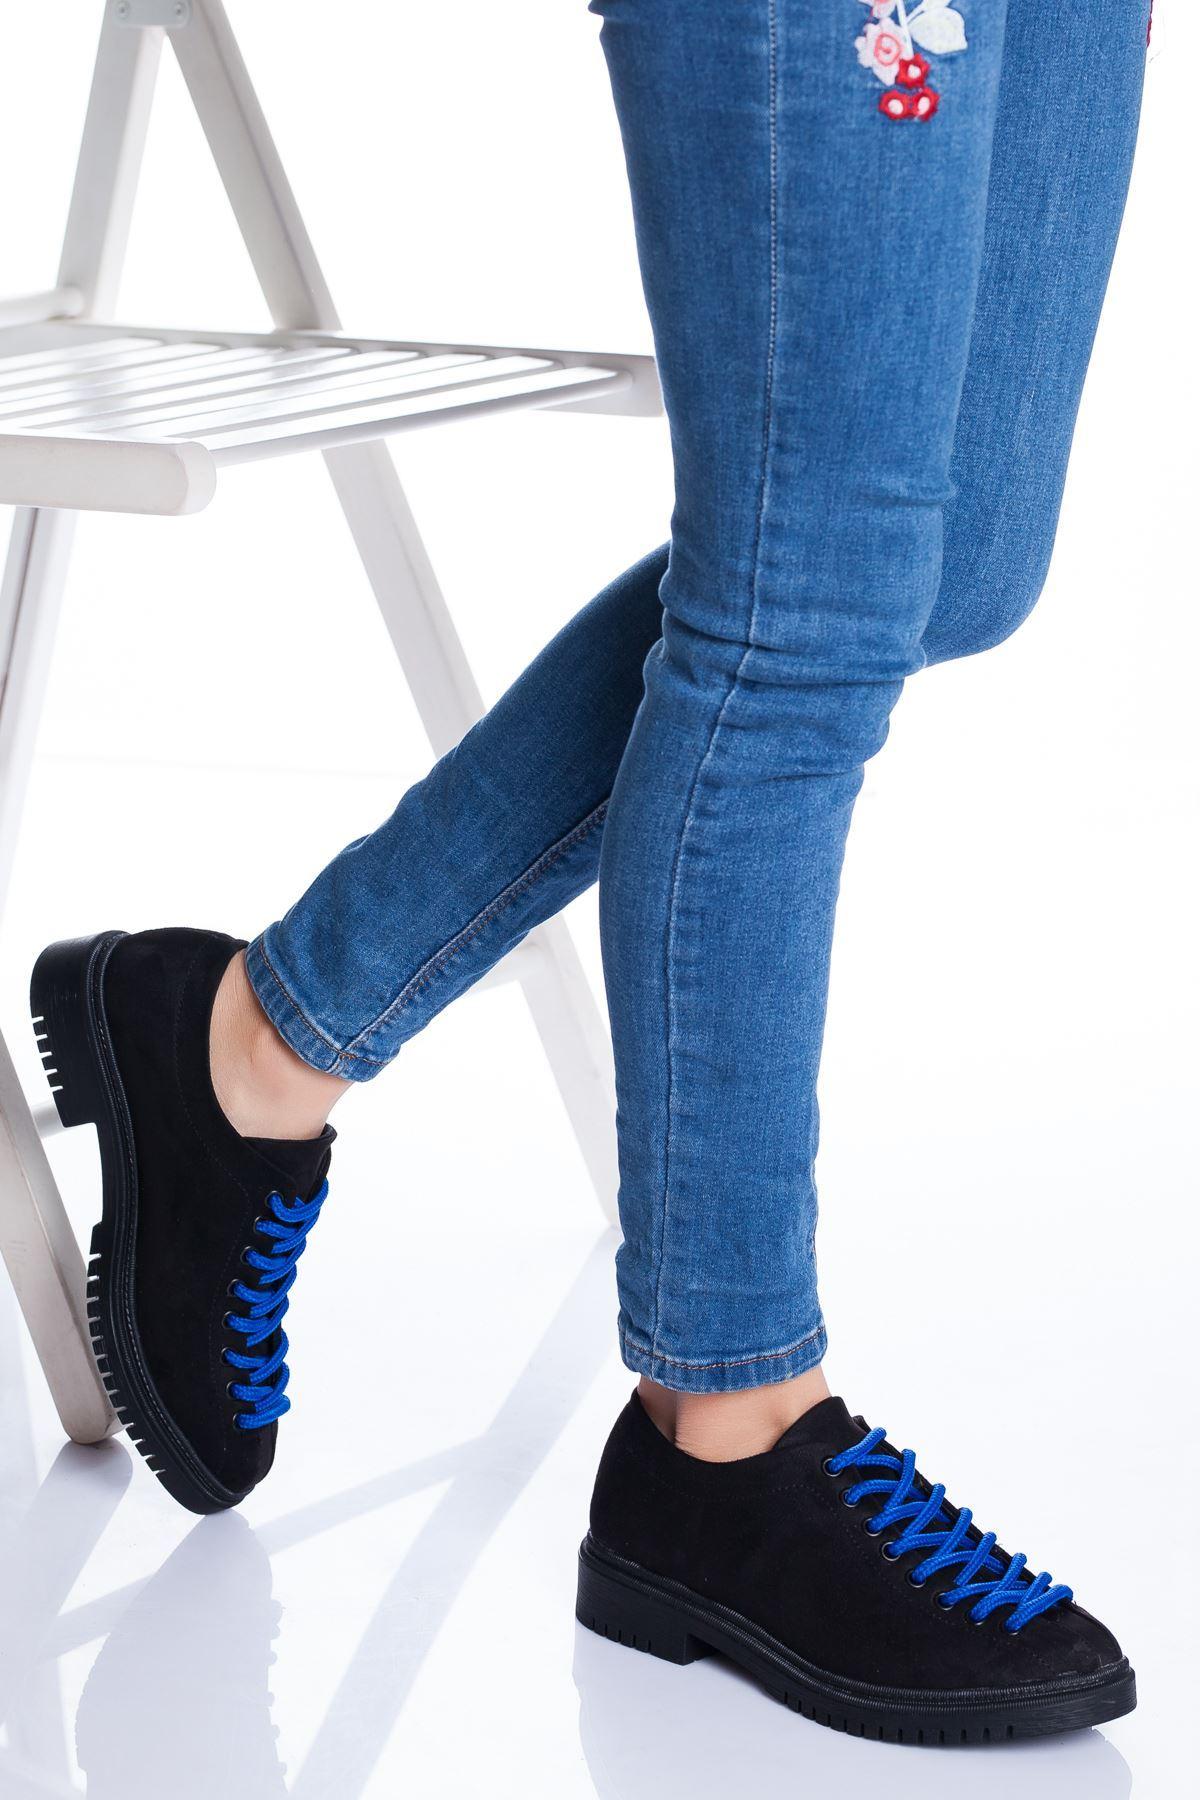 Tamara Ayakkabı MAVİ